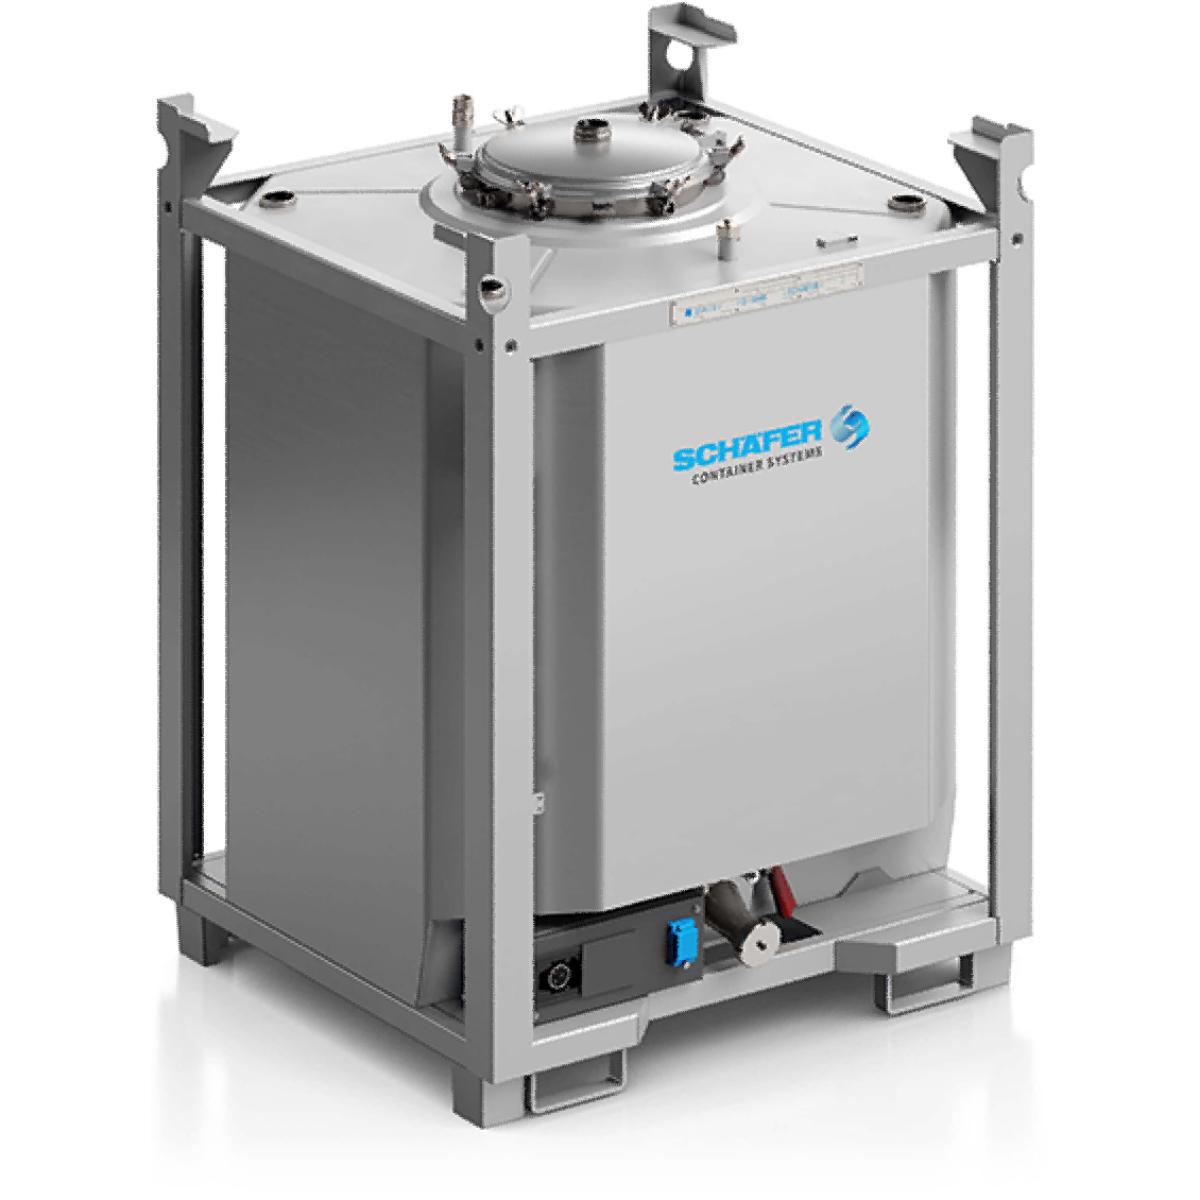 Schafer Heatable RCB